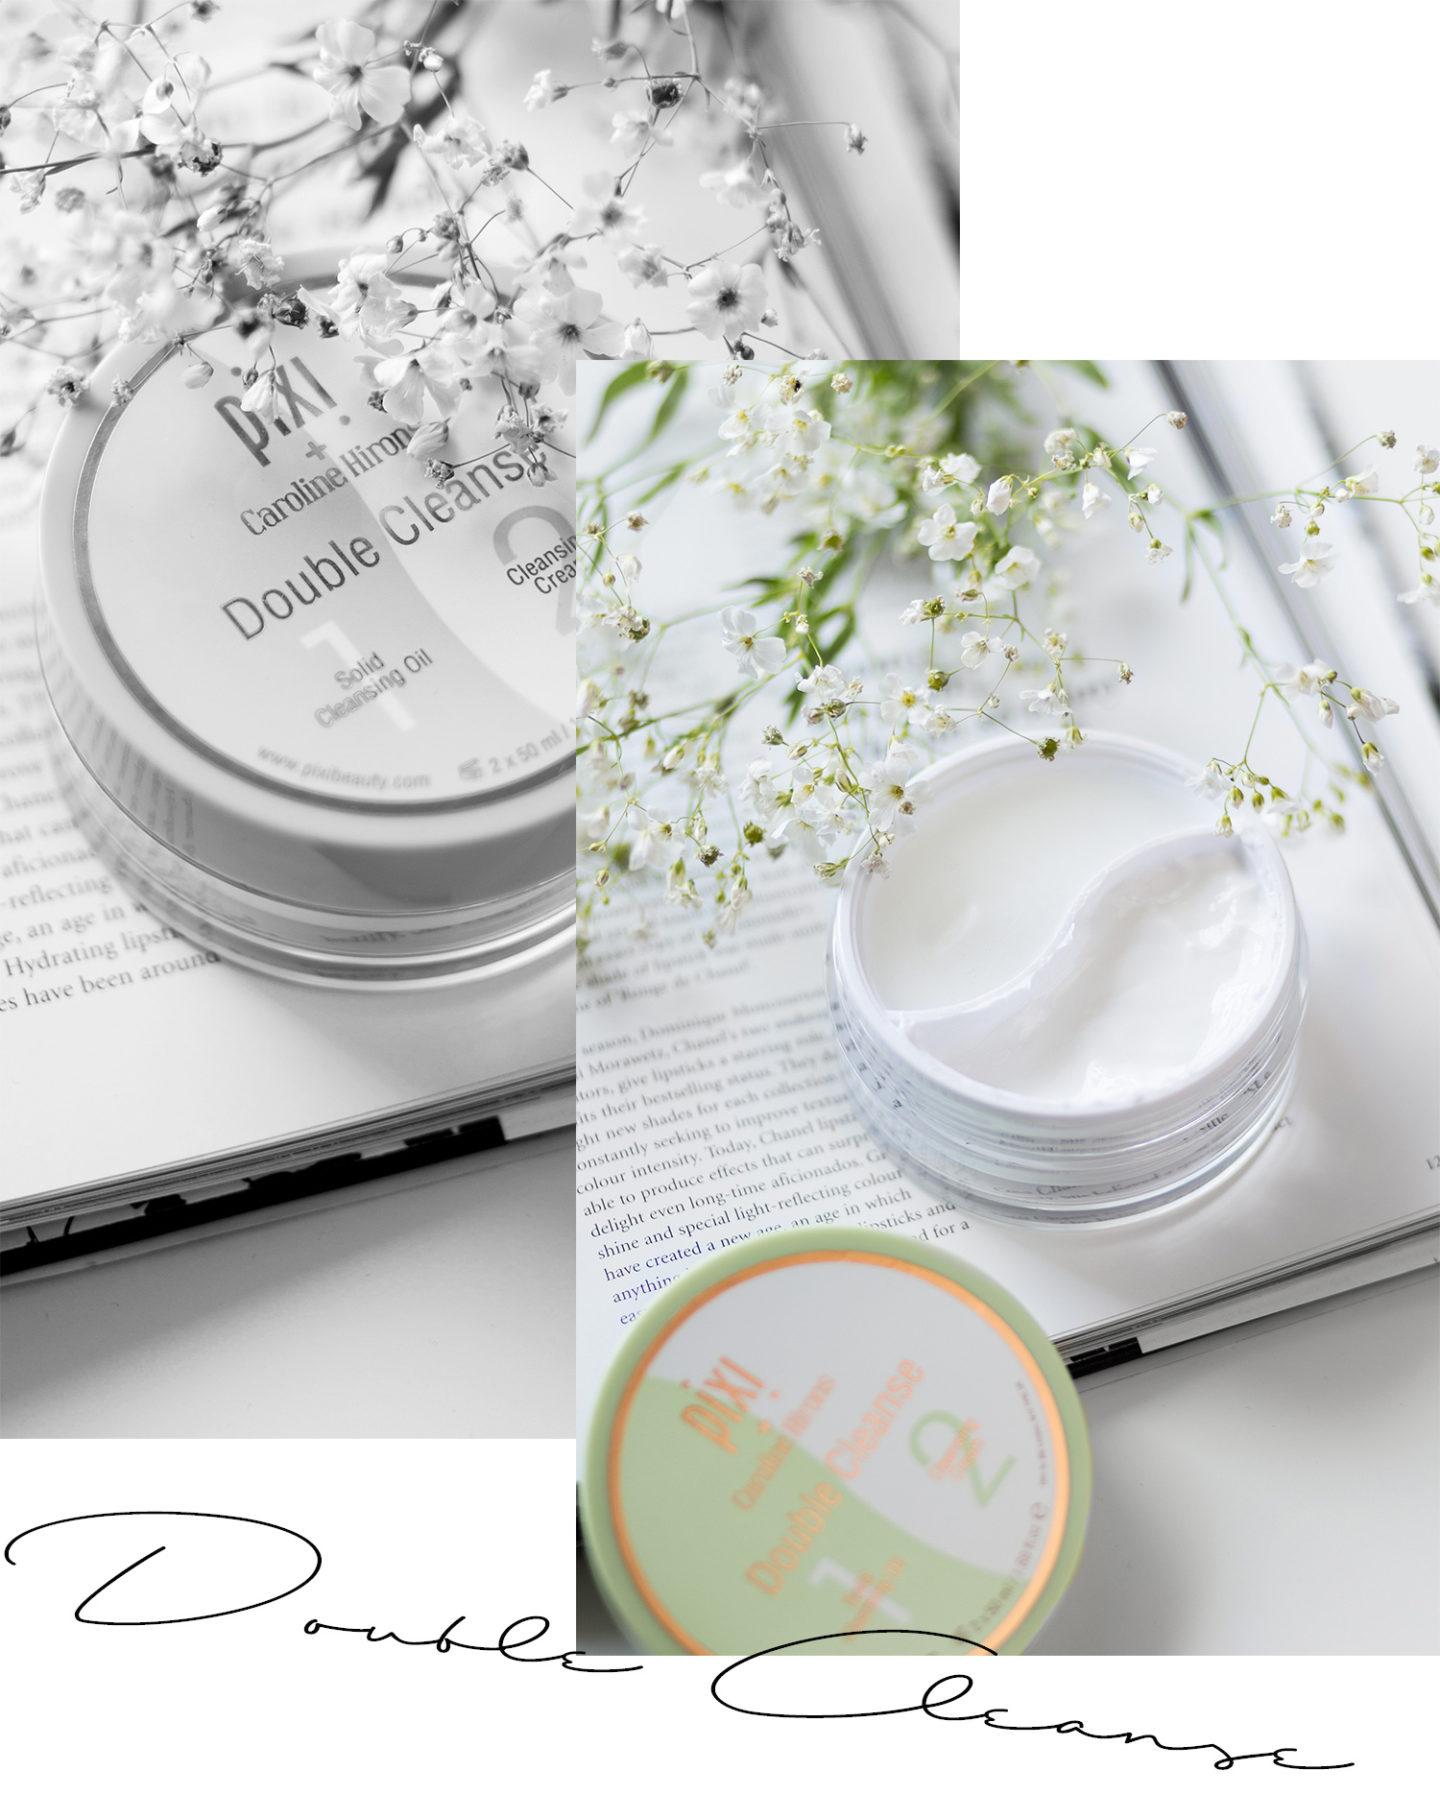 neuheiten-von pixi-double-cleanse-beauty-skincare-review-test-erfahrung-strahlende-haut-sommer-bezauberndenana